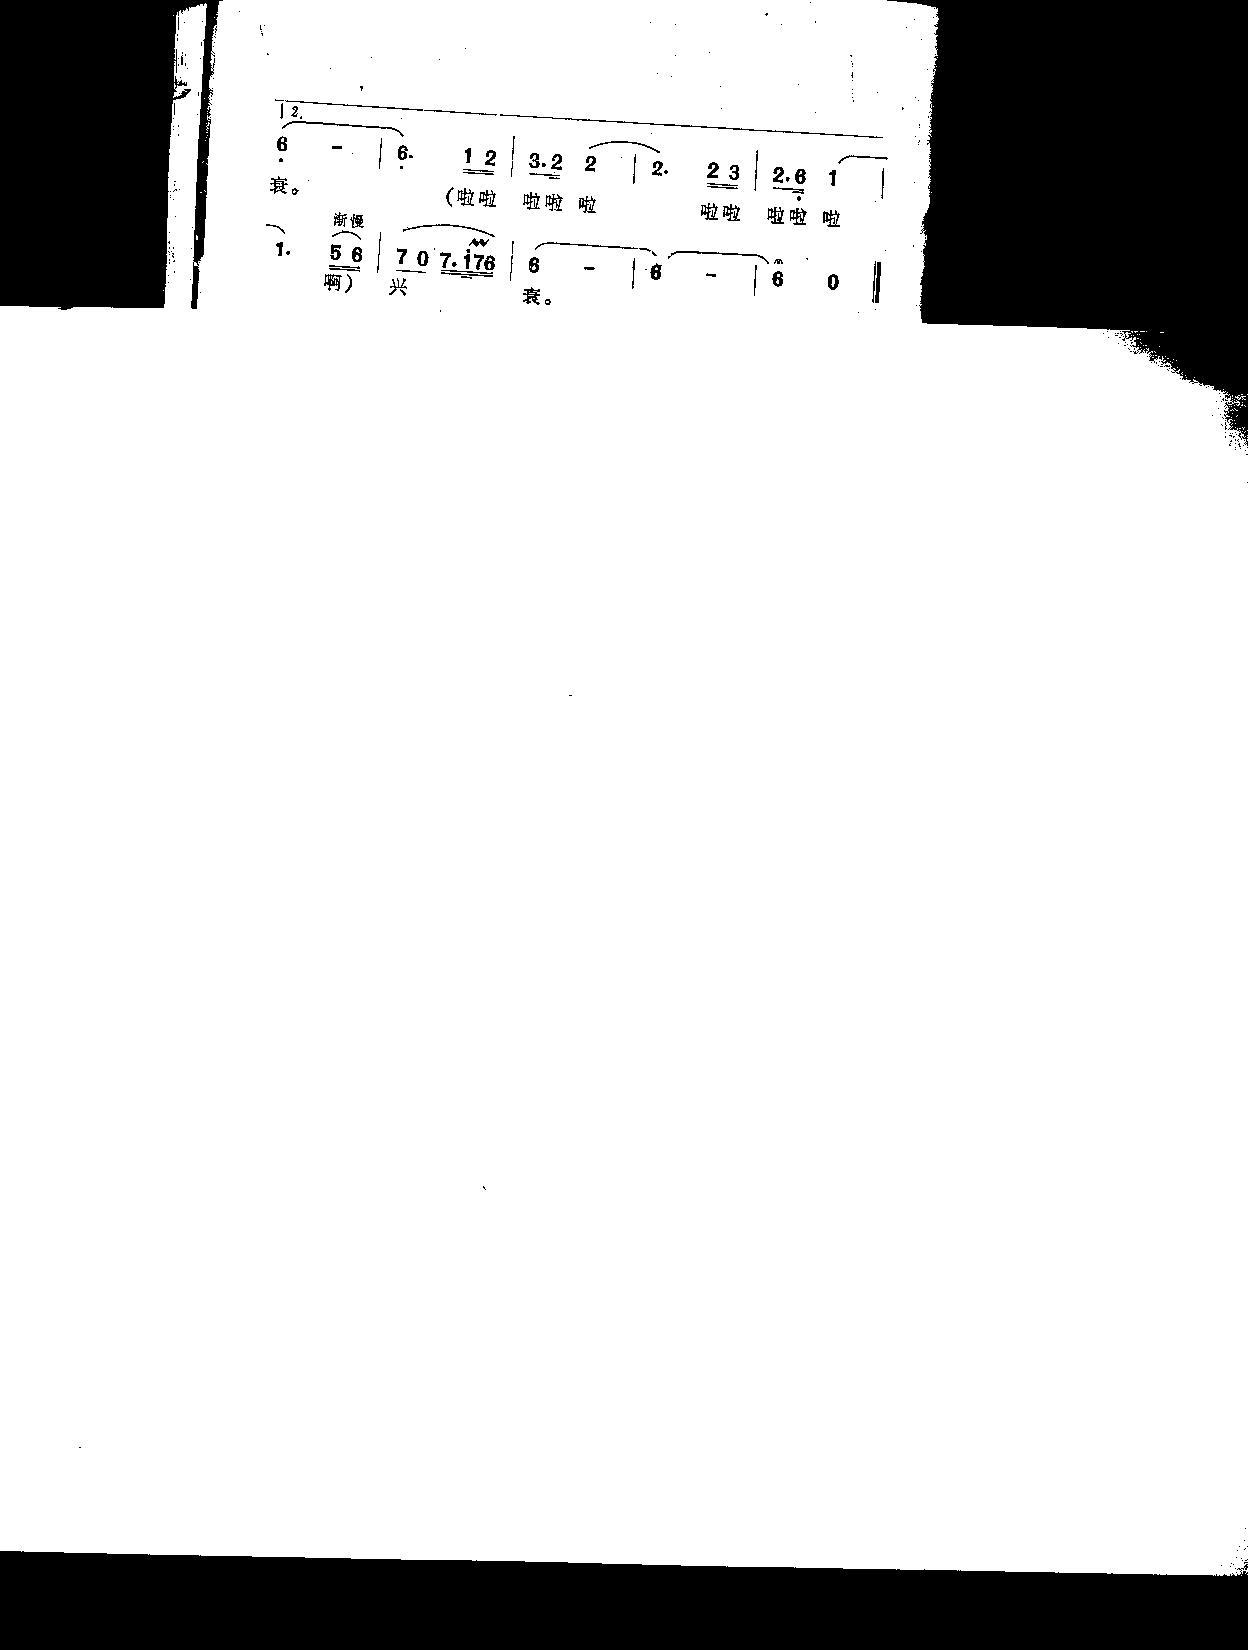 ppt 背景 背景图片 边框 模板 设计 矢量 矢量图 素材 相框 1248_1650